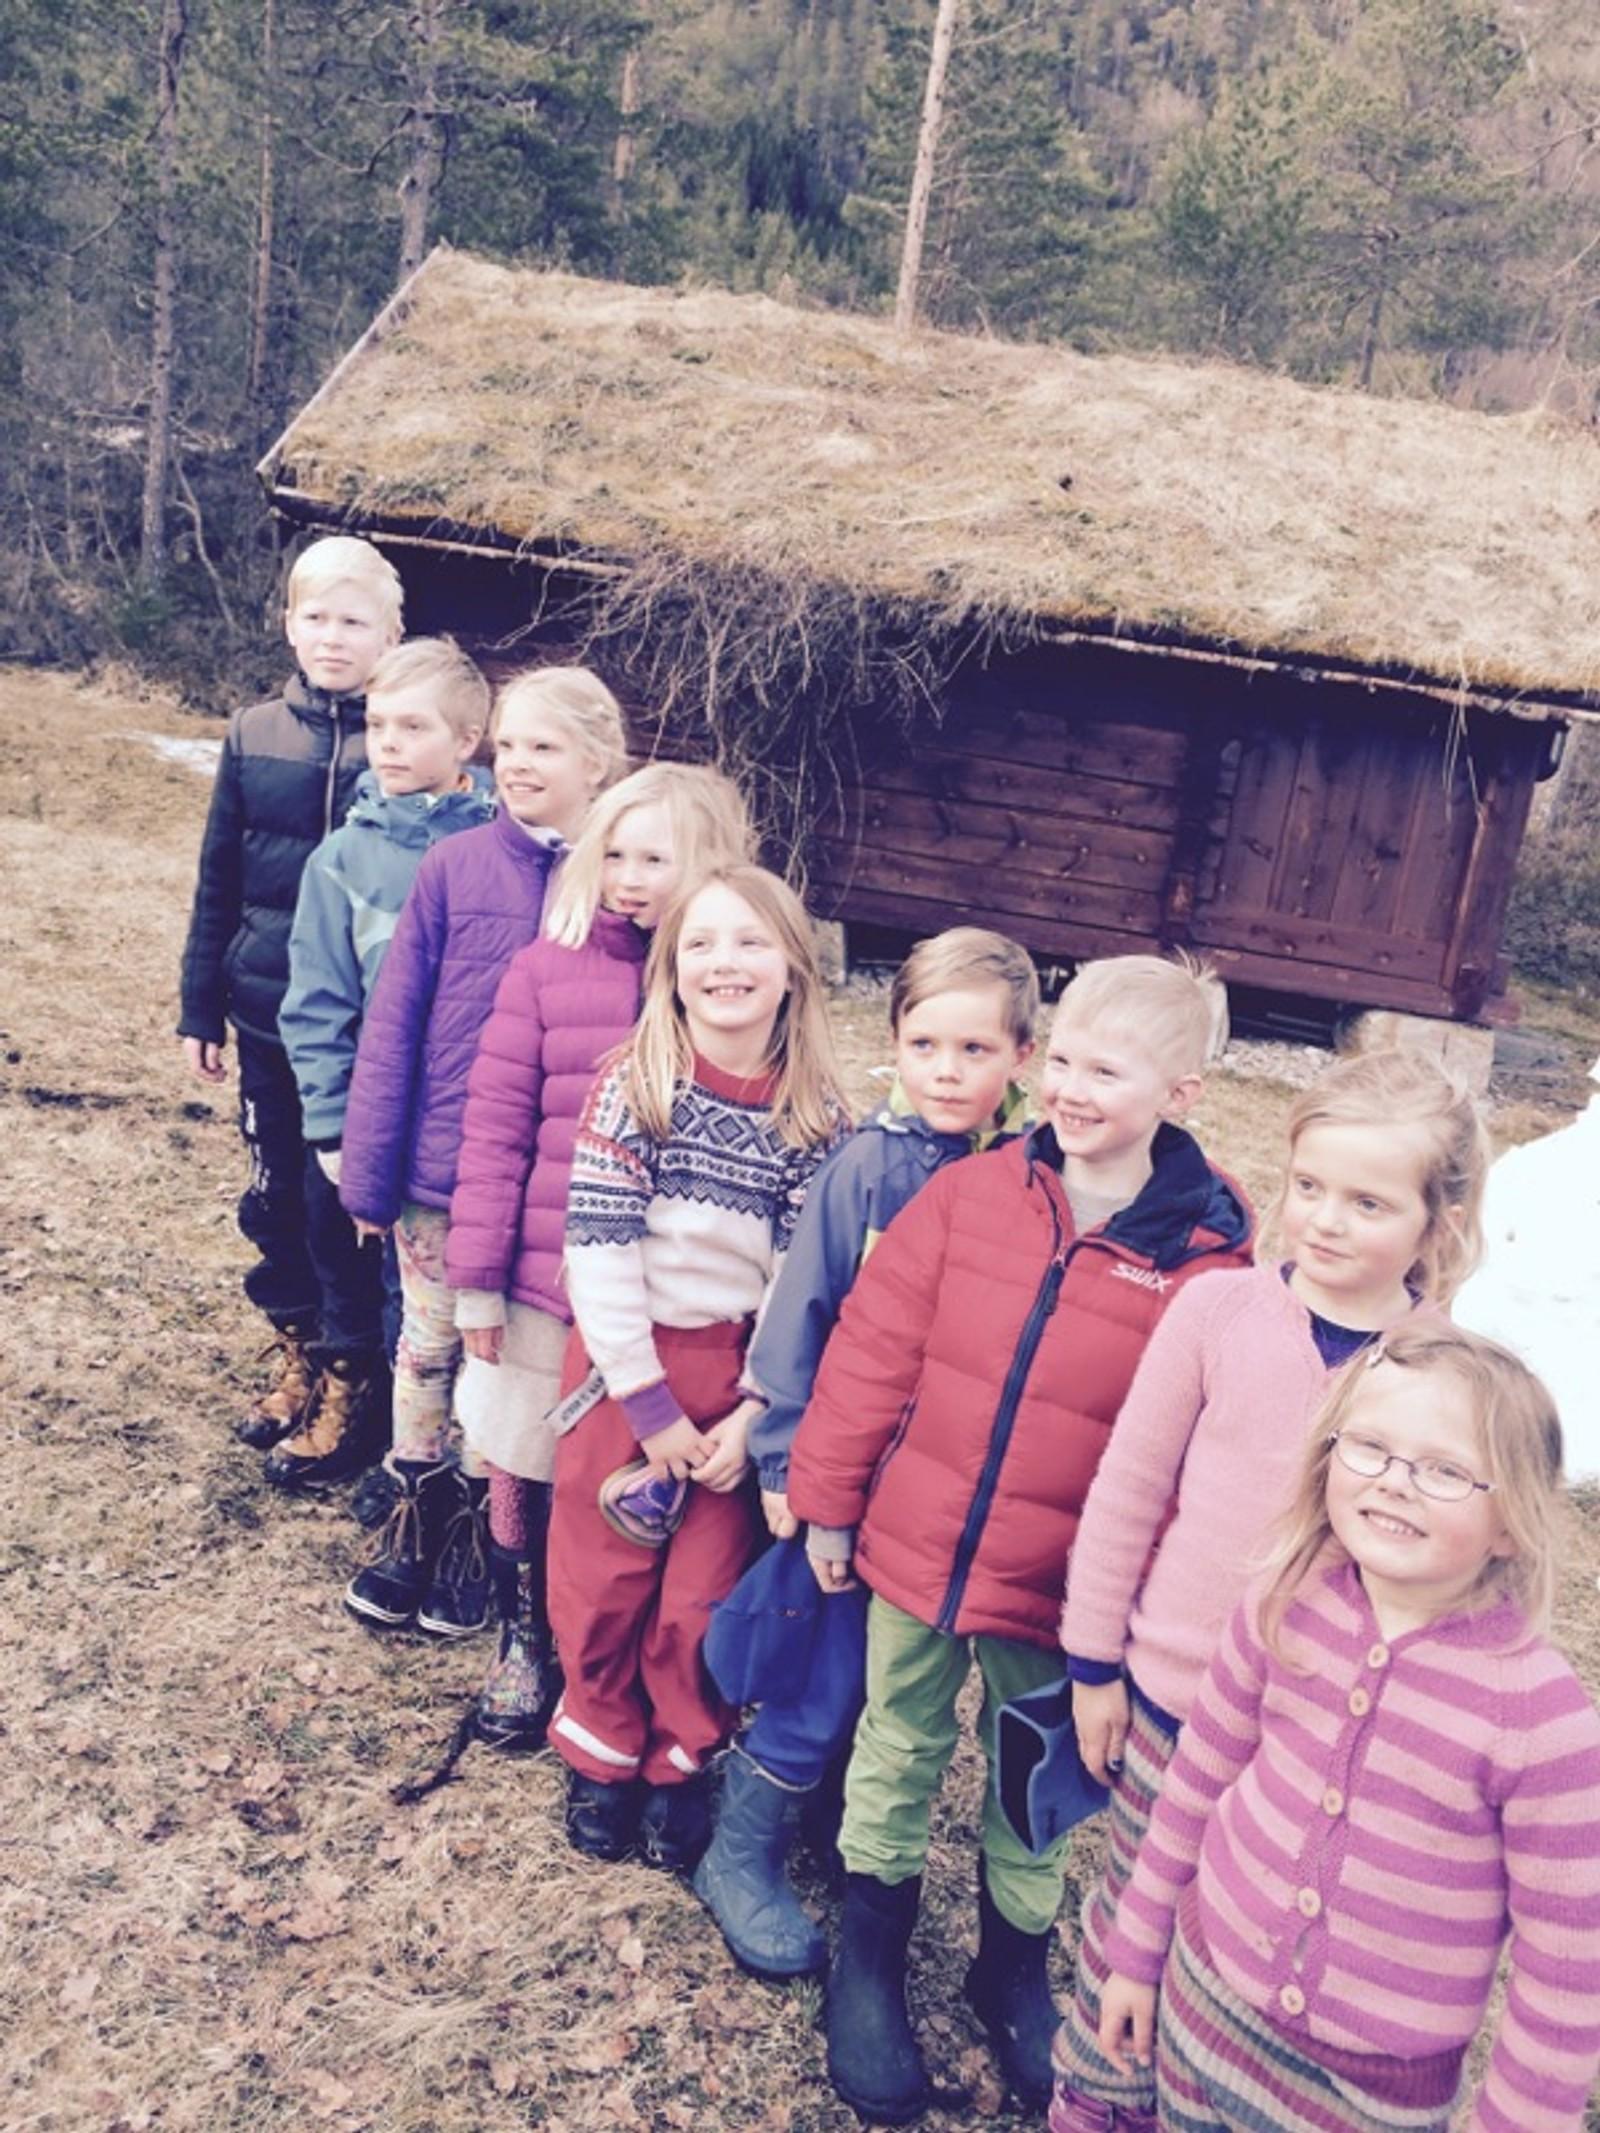 Glade tremenningar Endre, Lucas, Ingrid, Mathea, Rebecca, Mikal, Peder, Oline og Anne klar for påskeeggjakt.